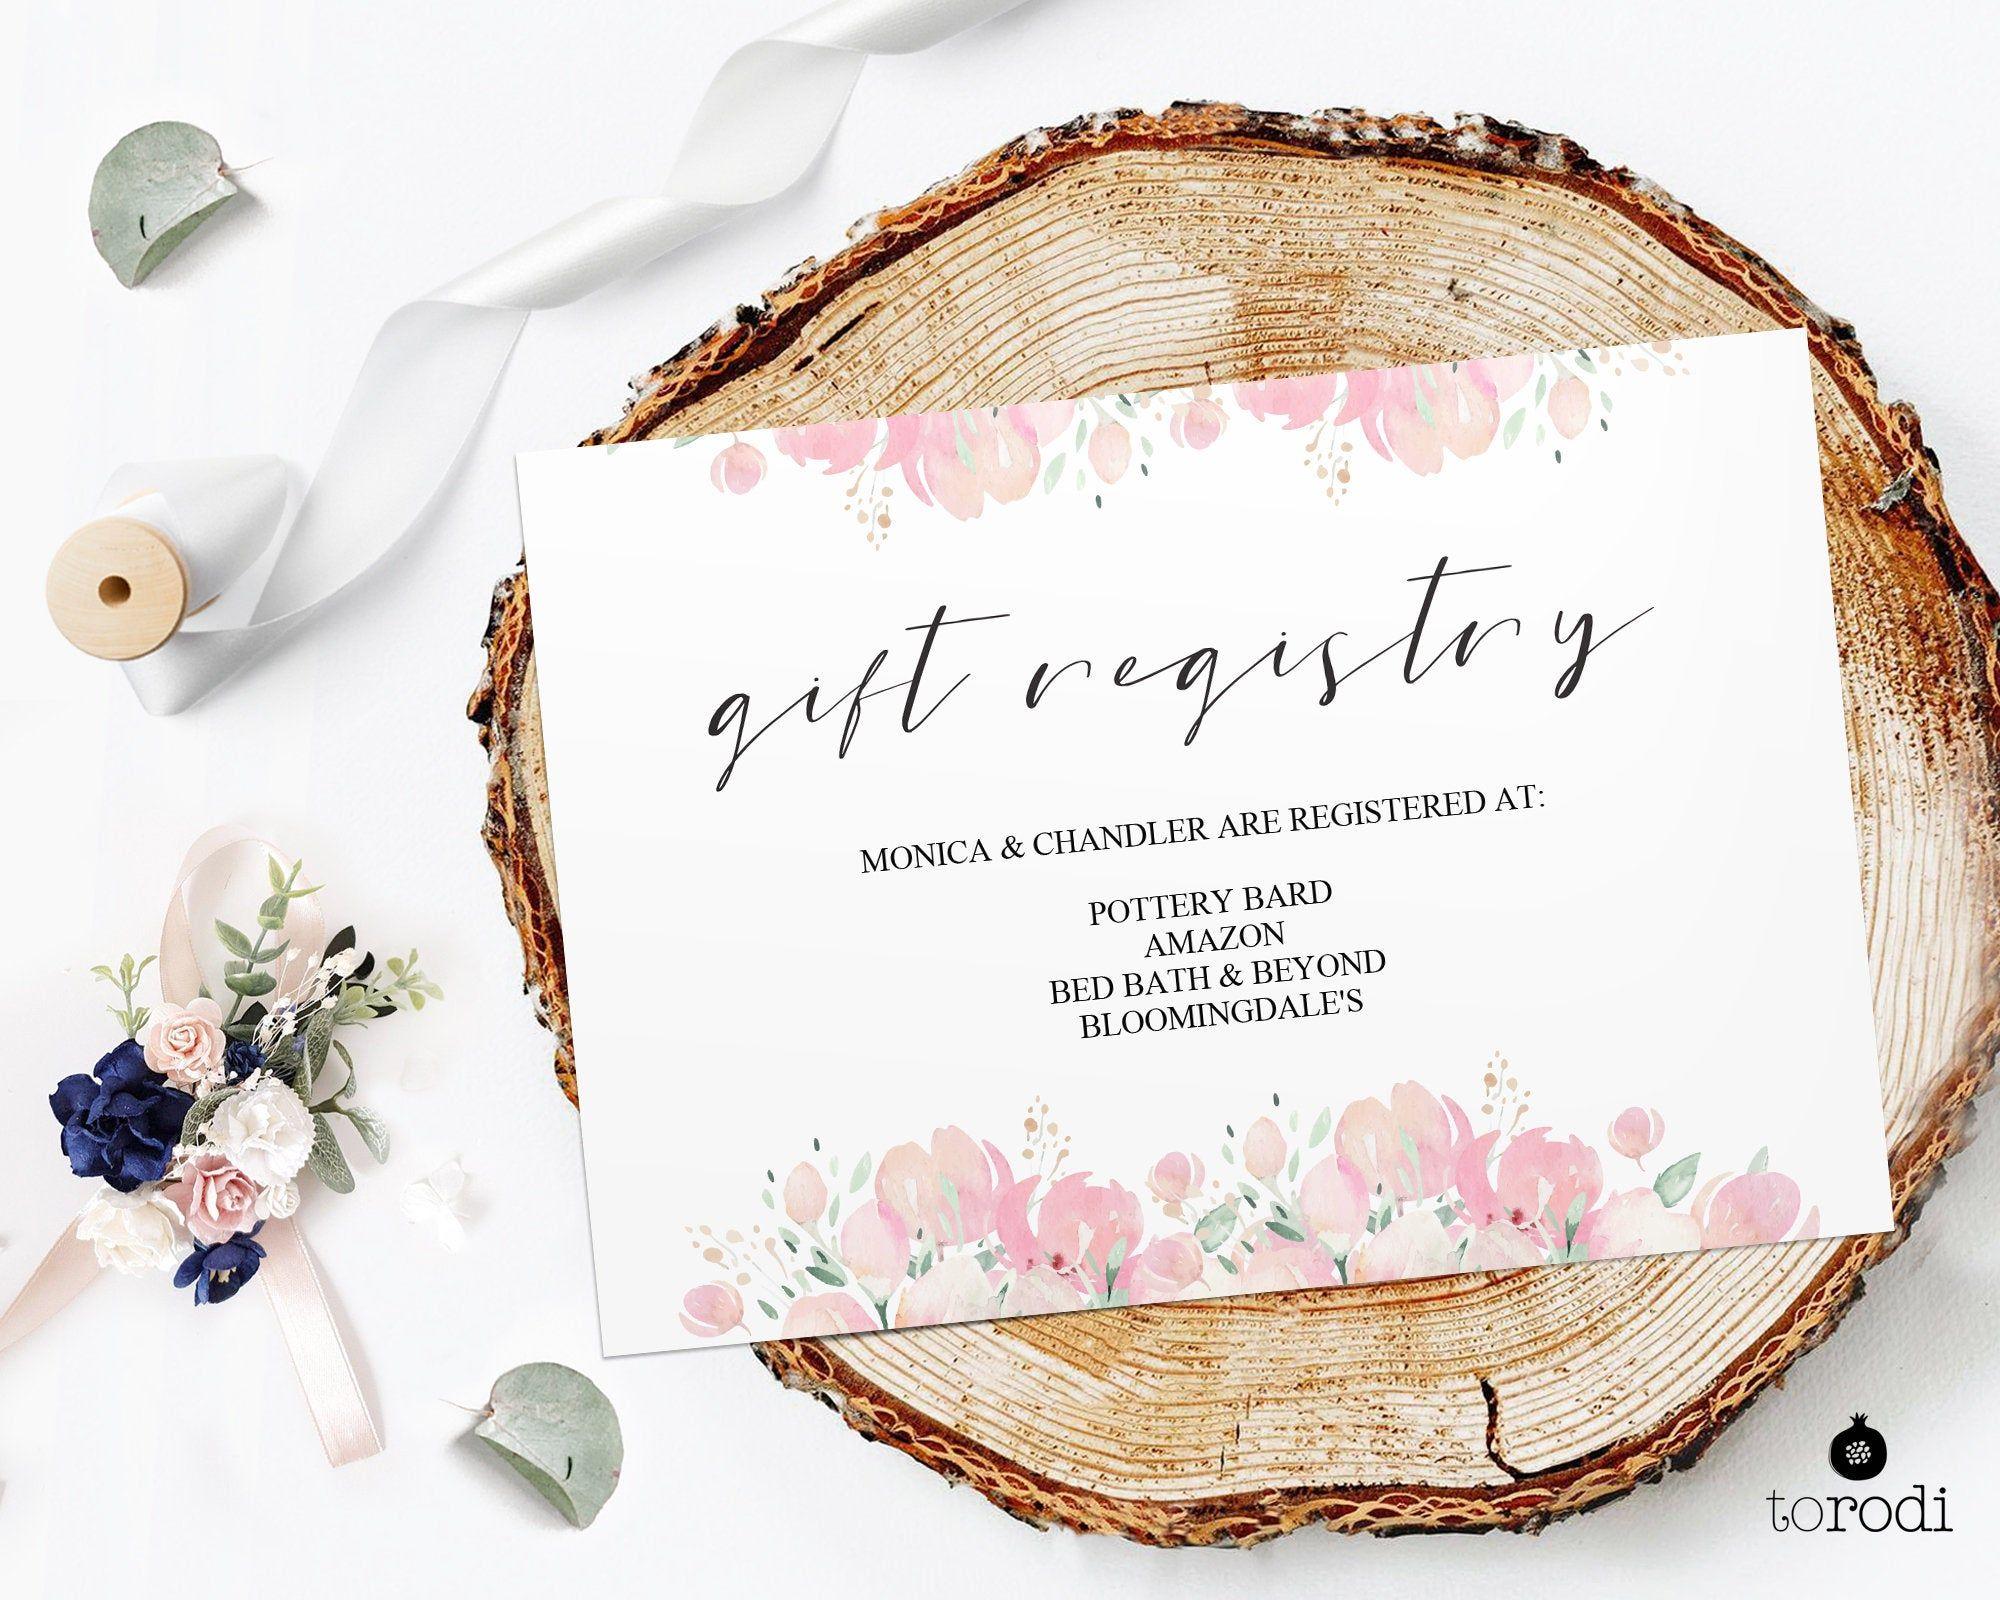 Gift Registry Card Template Wedding Registry Card Wedding Etsy Wedding Registry Cards Gift Registry Cards Registry Cards